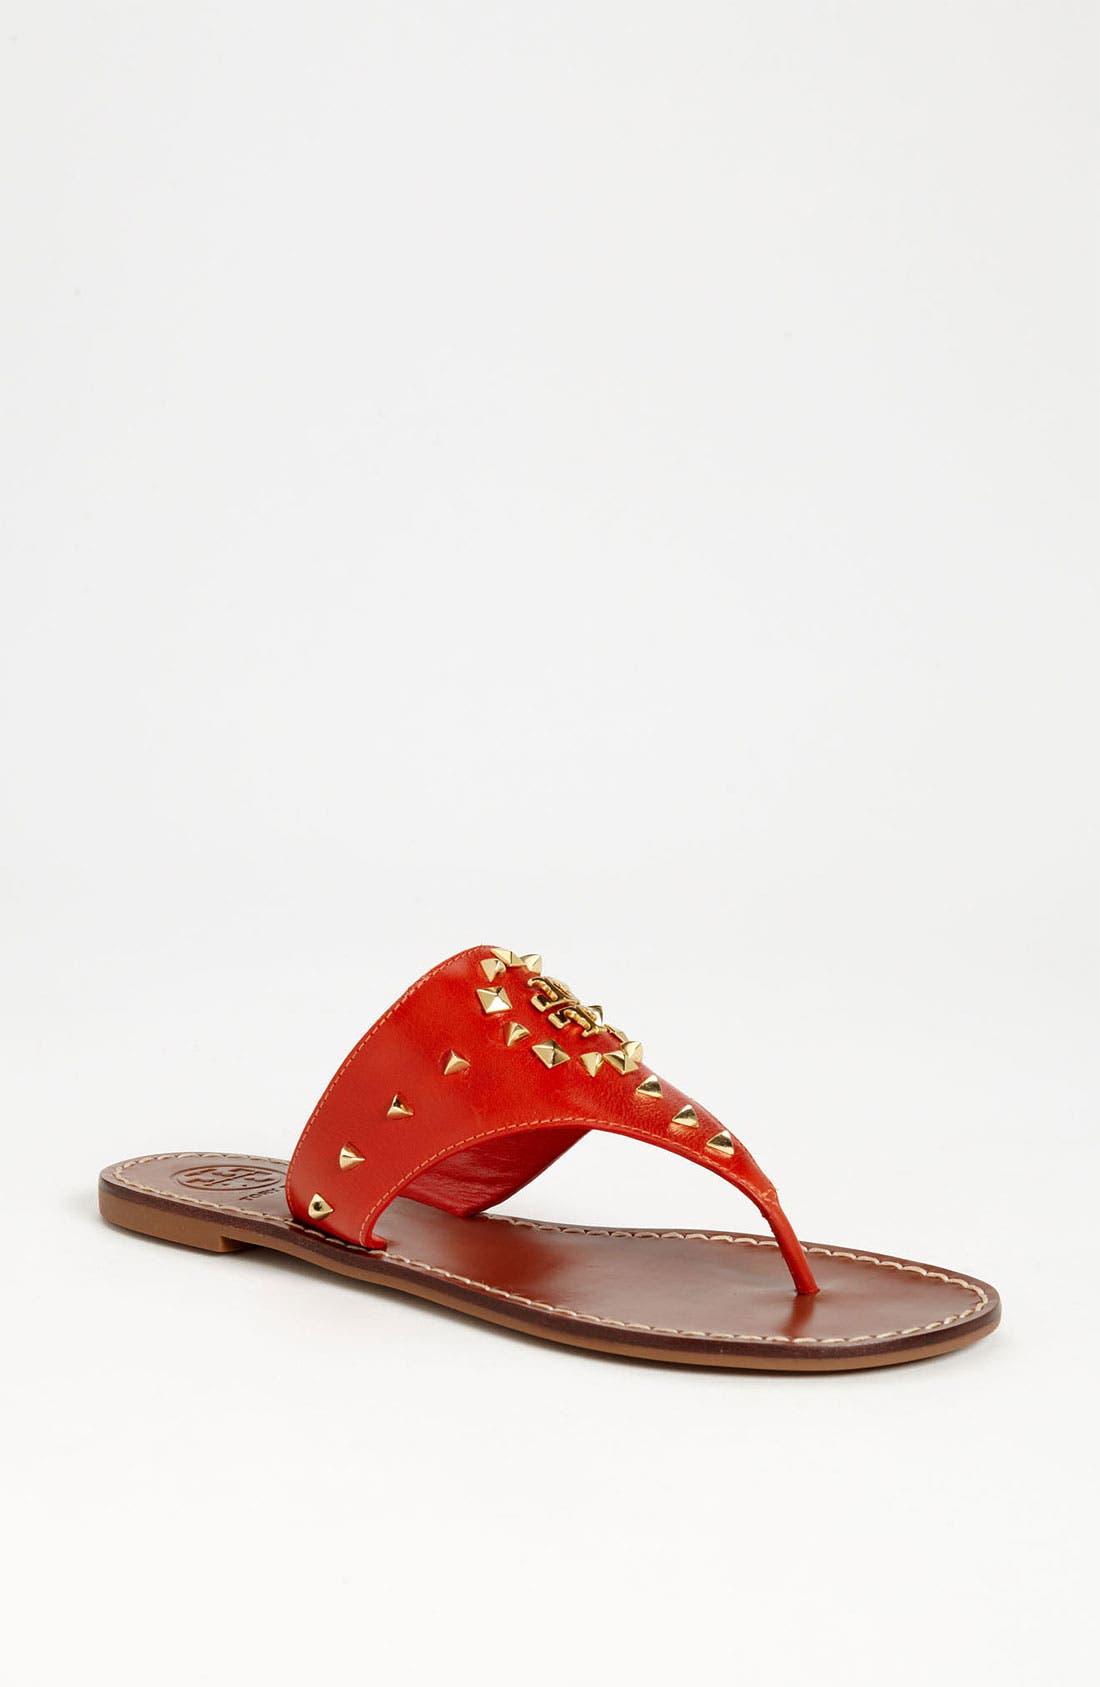 Alternate Image 1 Selected - Tory Burch 'Dale' Thong Sandal